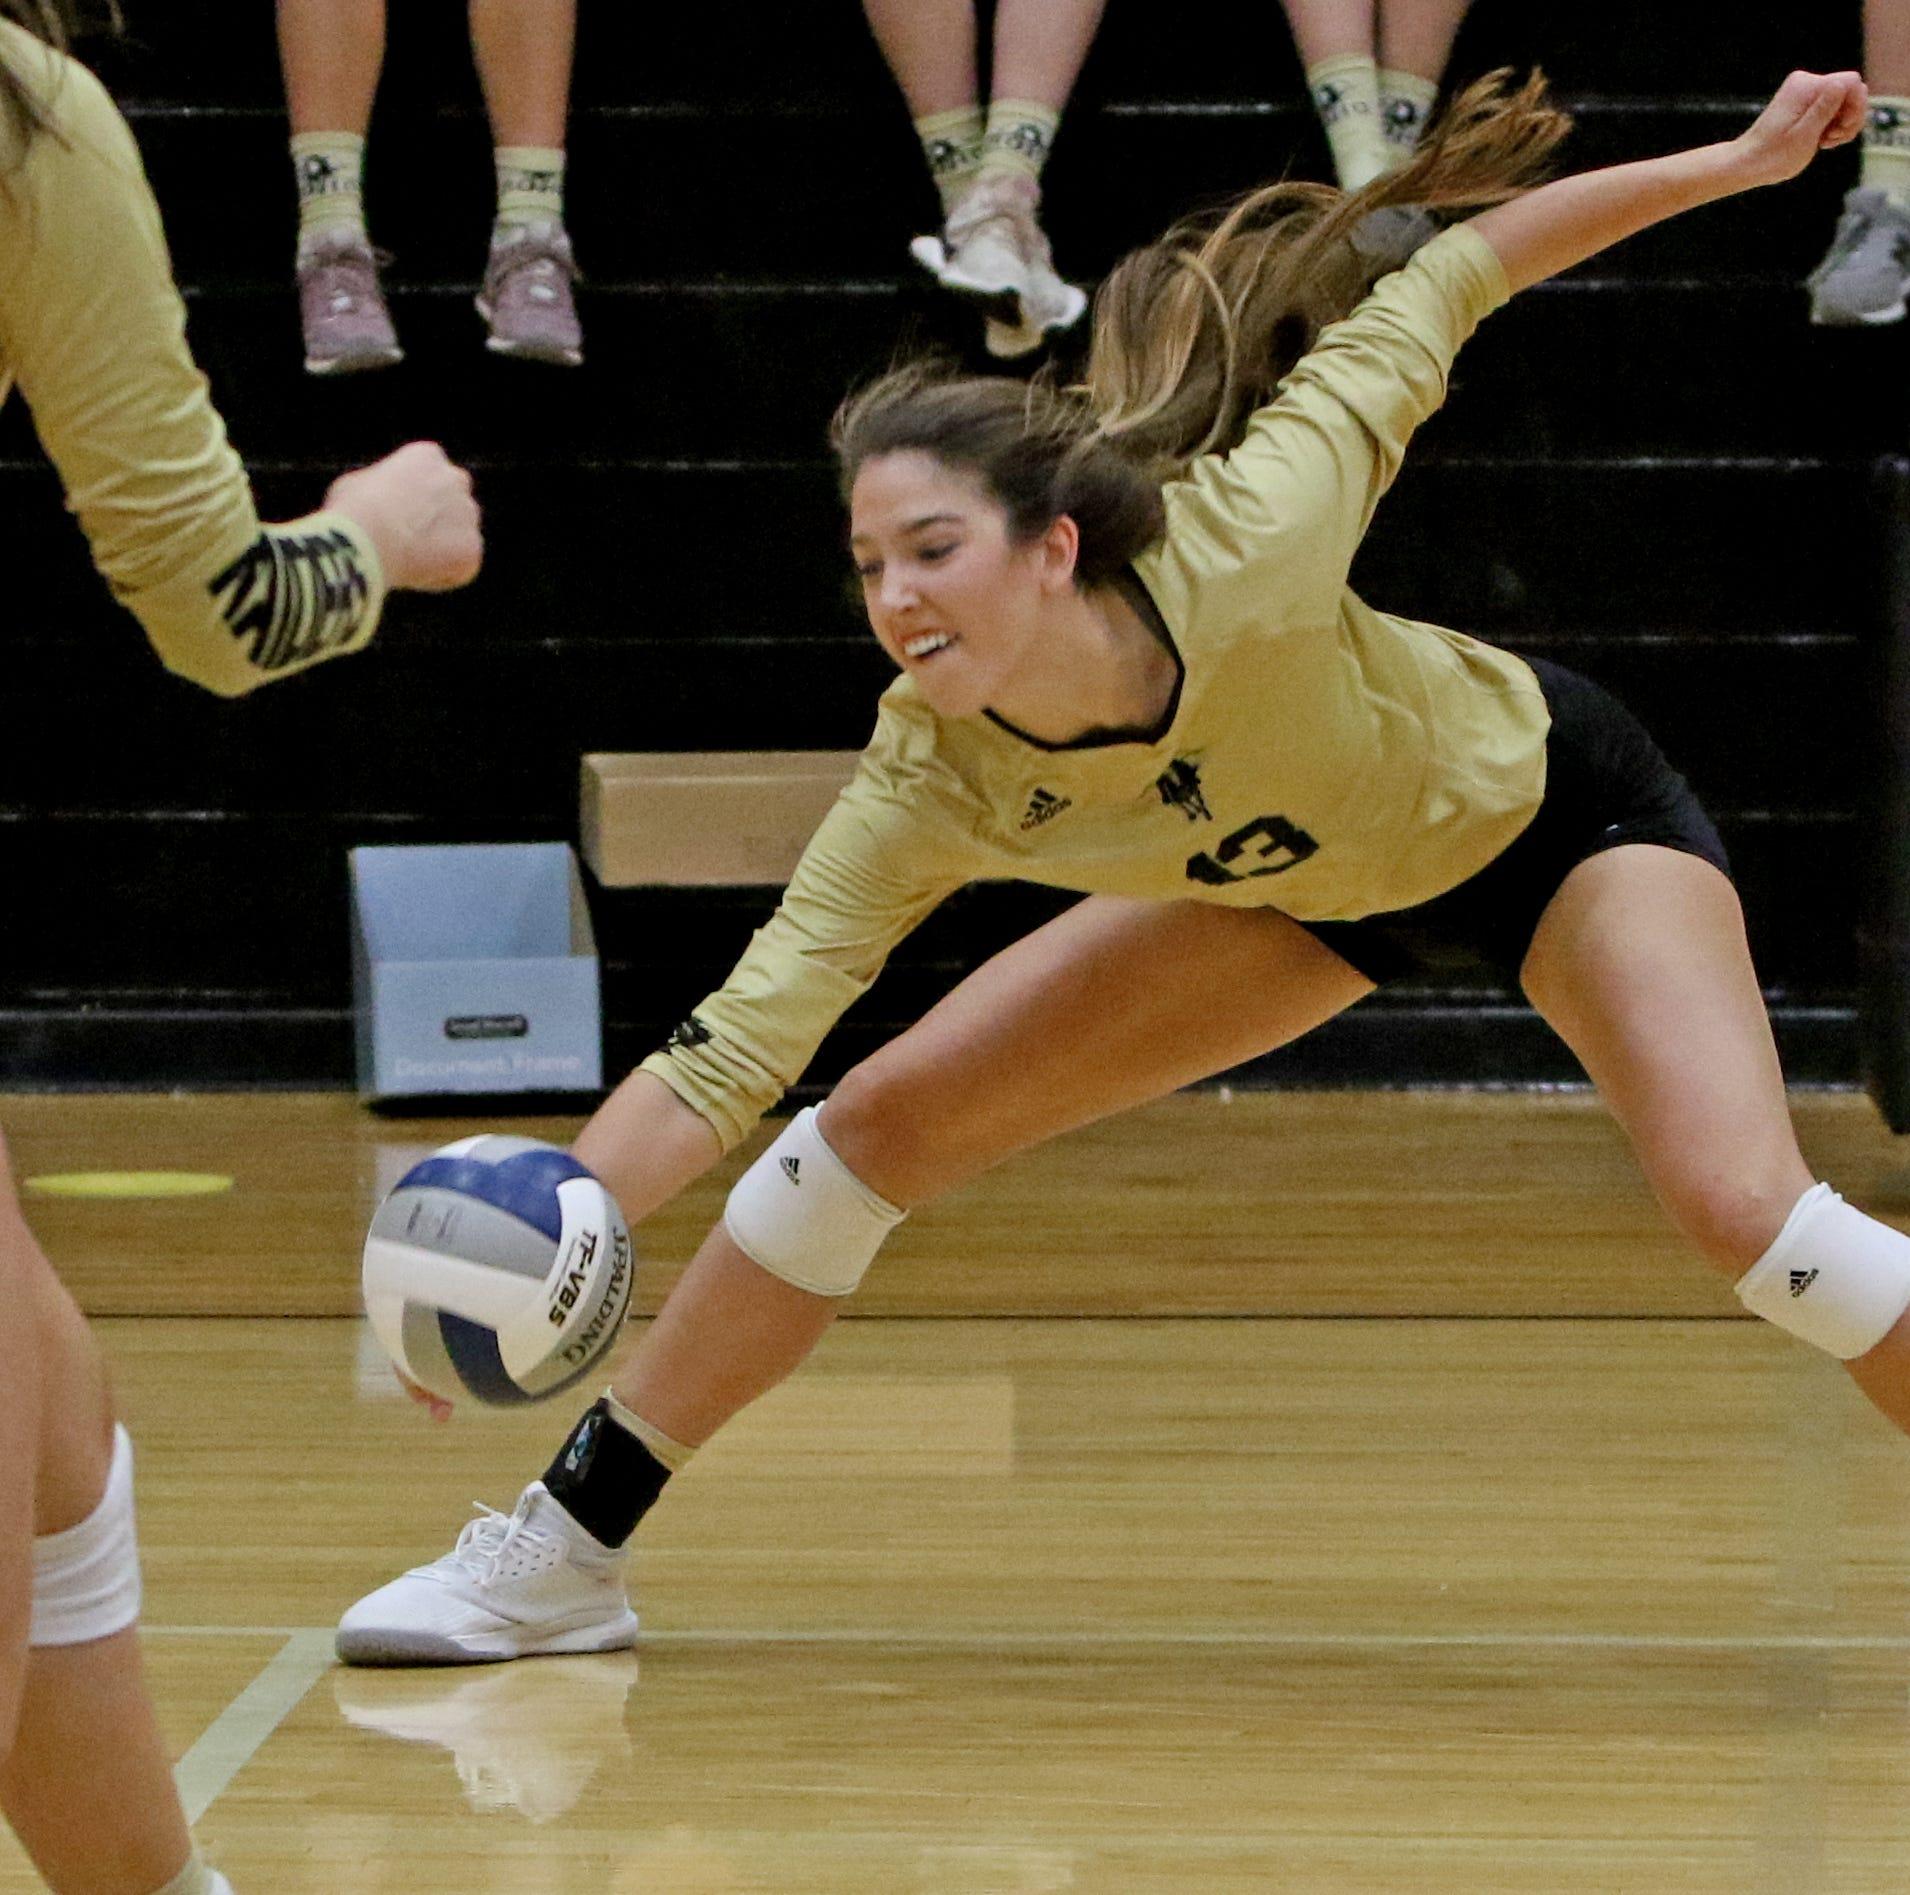 2018 Wichita Falls area high school volleyball all-district teams